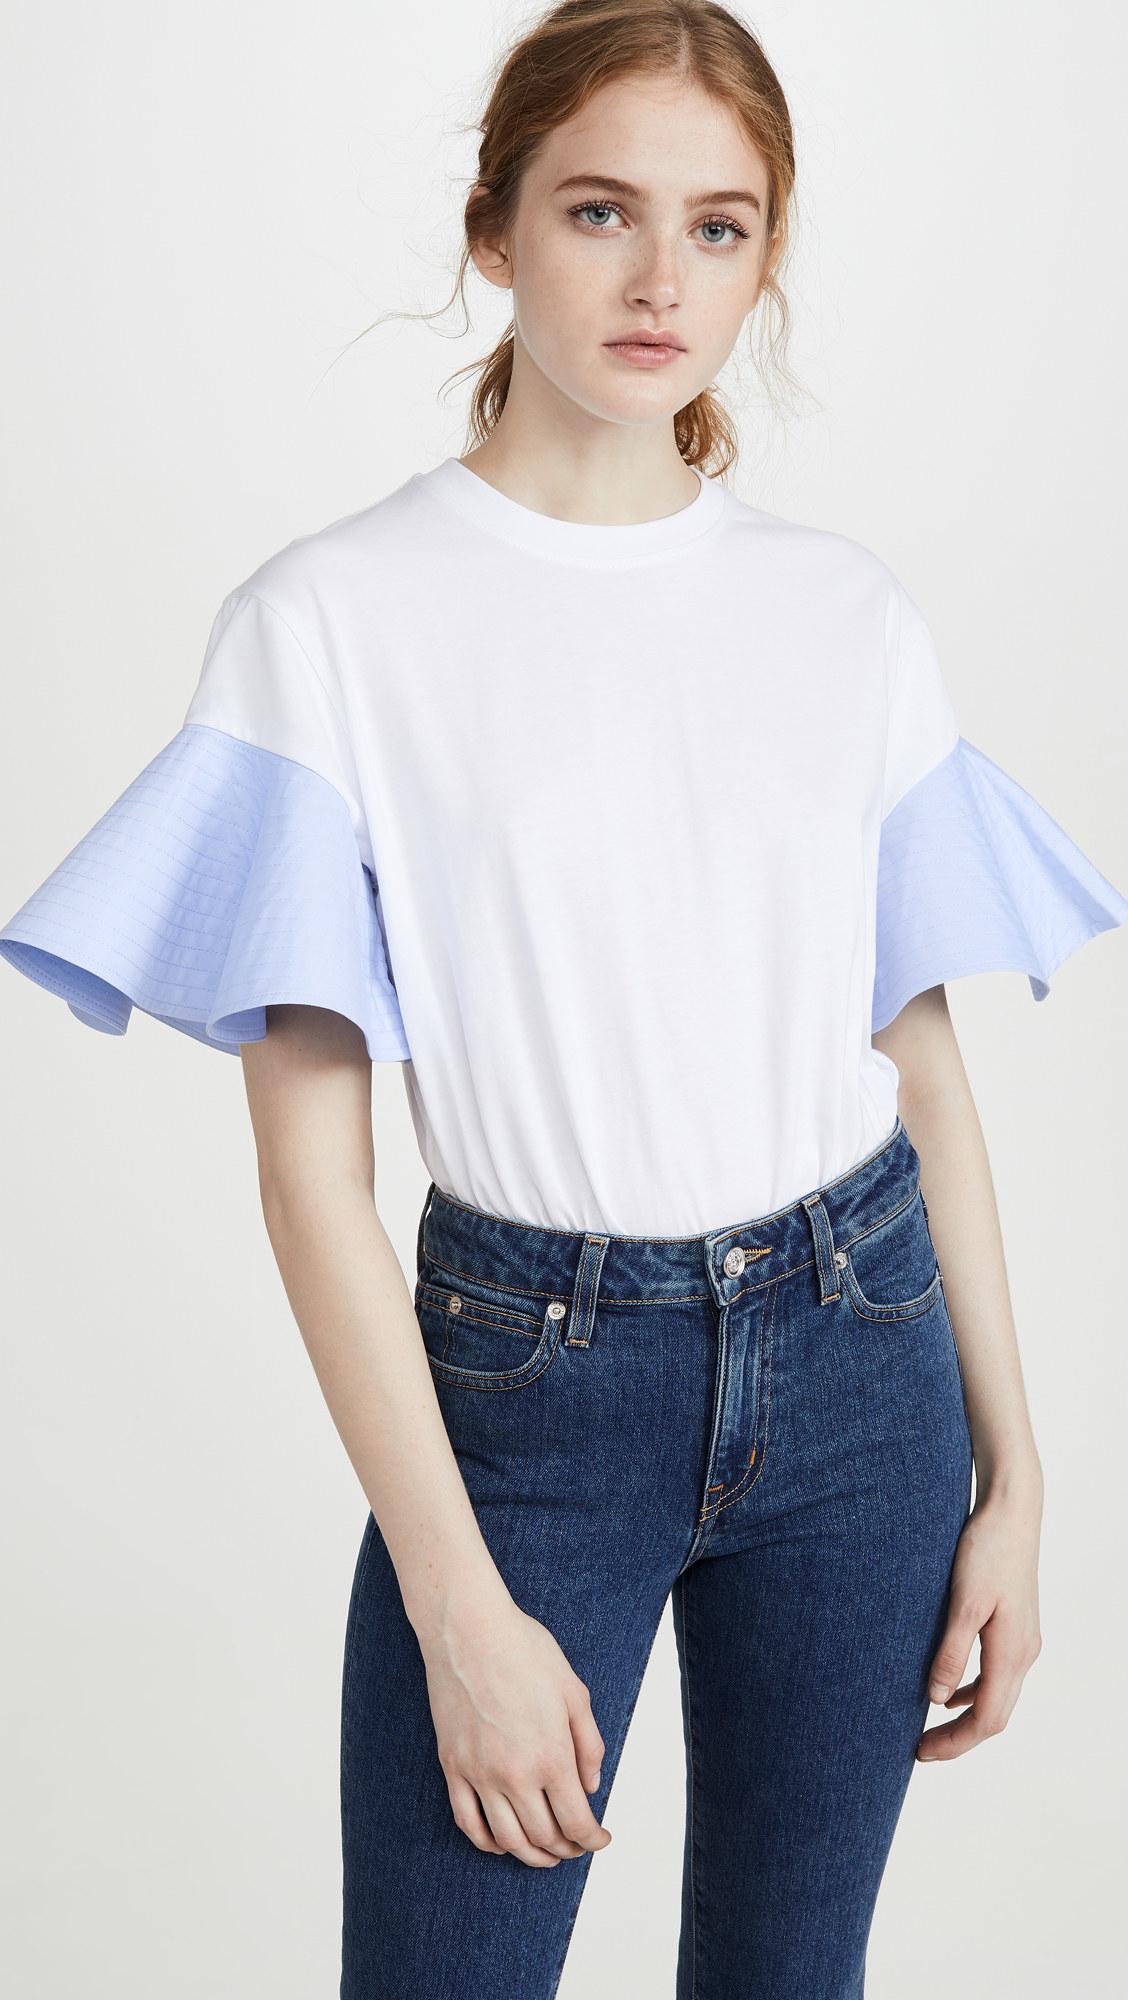 A model wearing the Victoria Victoria Beckham ruffle sleeve T-shirt.